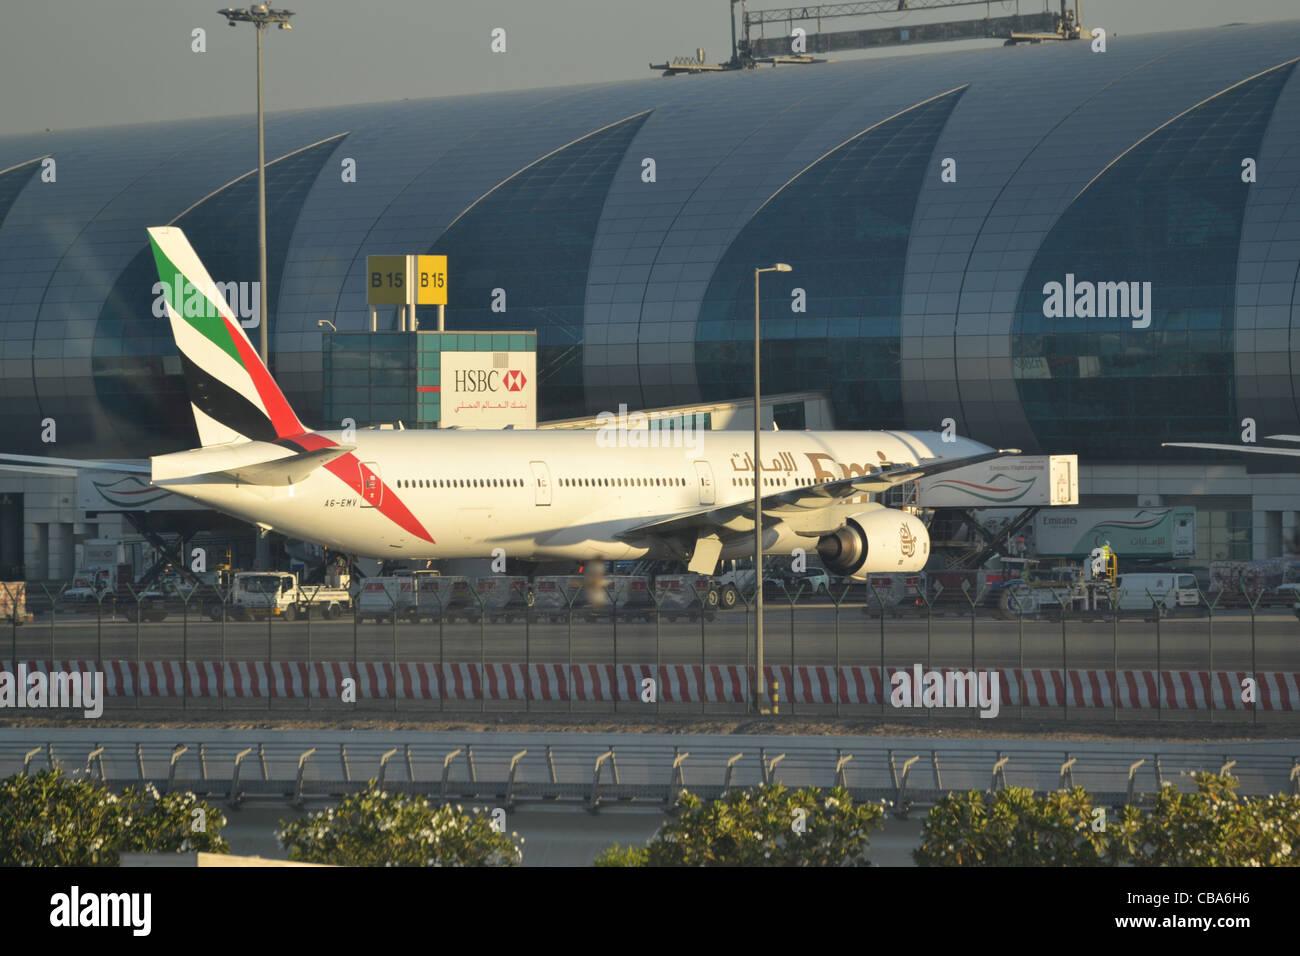 Emirates aircraft parked at Dubai International Airport, UAE - Stock Image